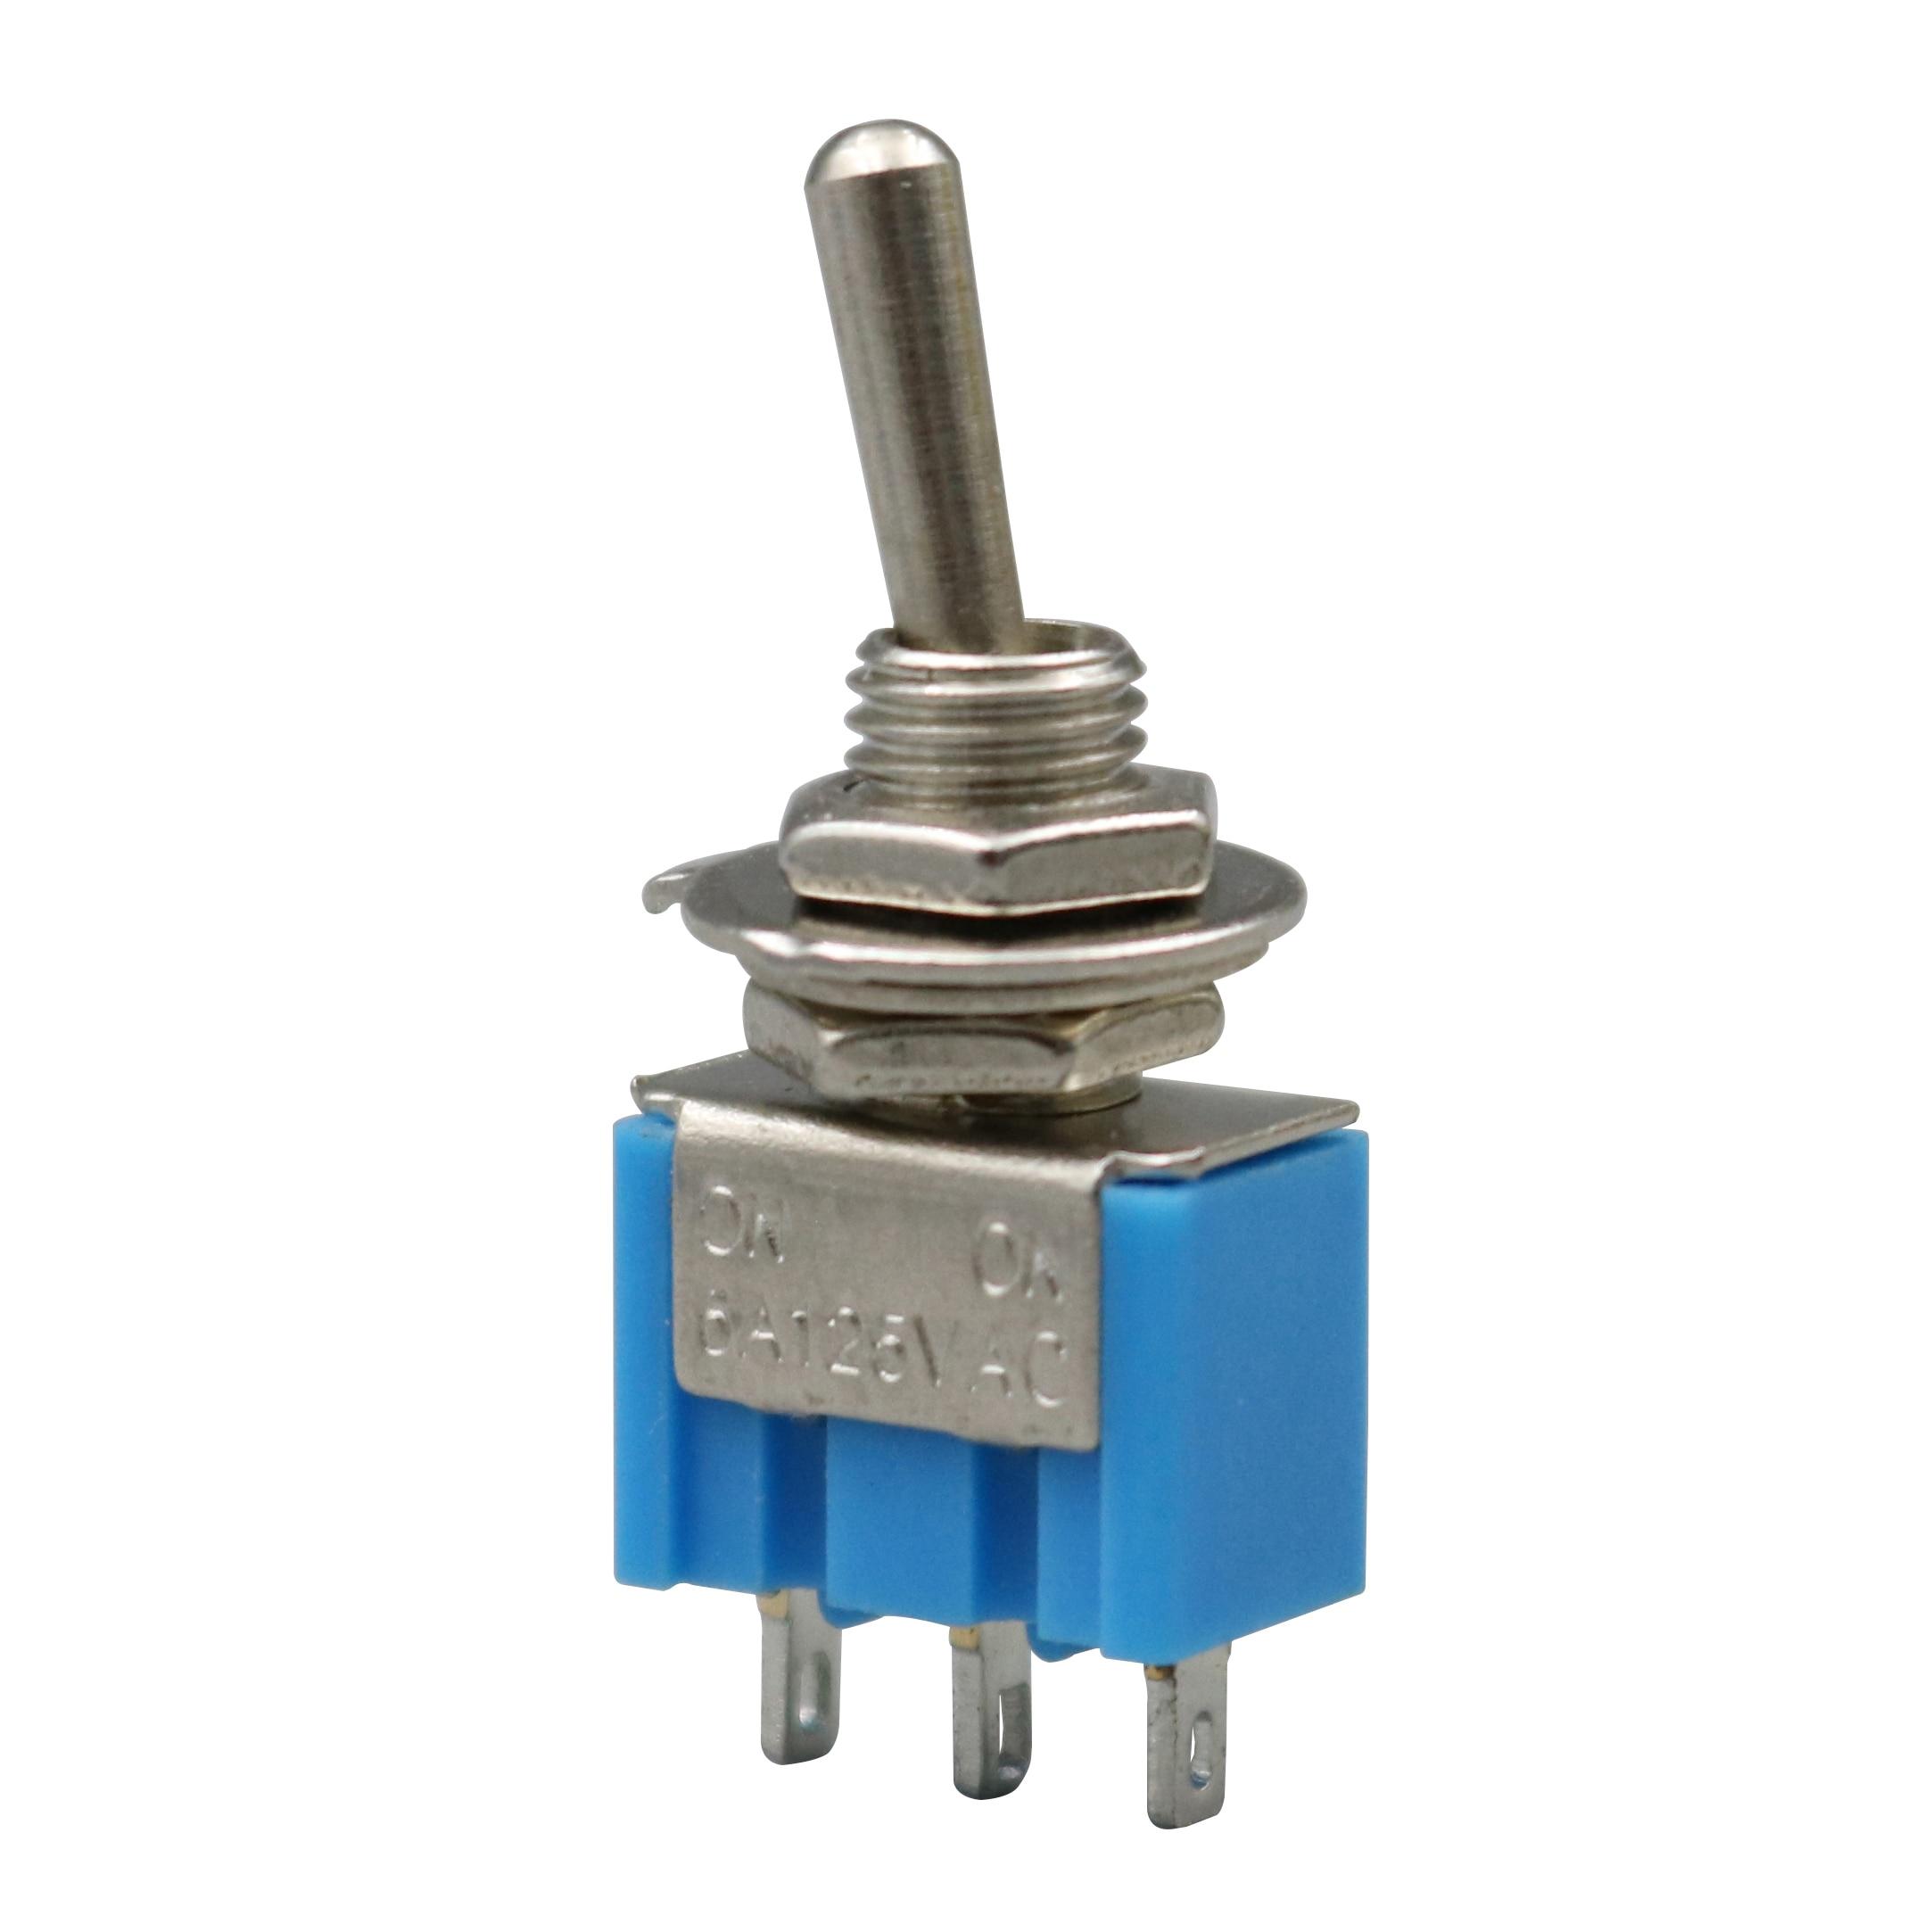 10 pçs azul MTS-102 3 pinos 6mm mini spdt ON--ON 6a 125vac interruptores de alavanca